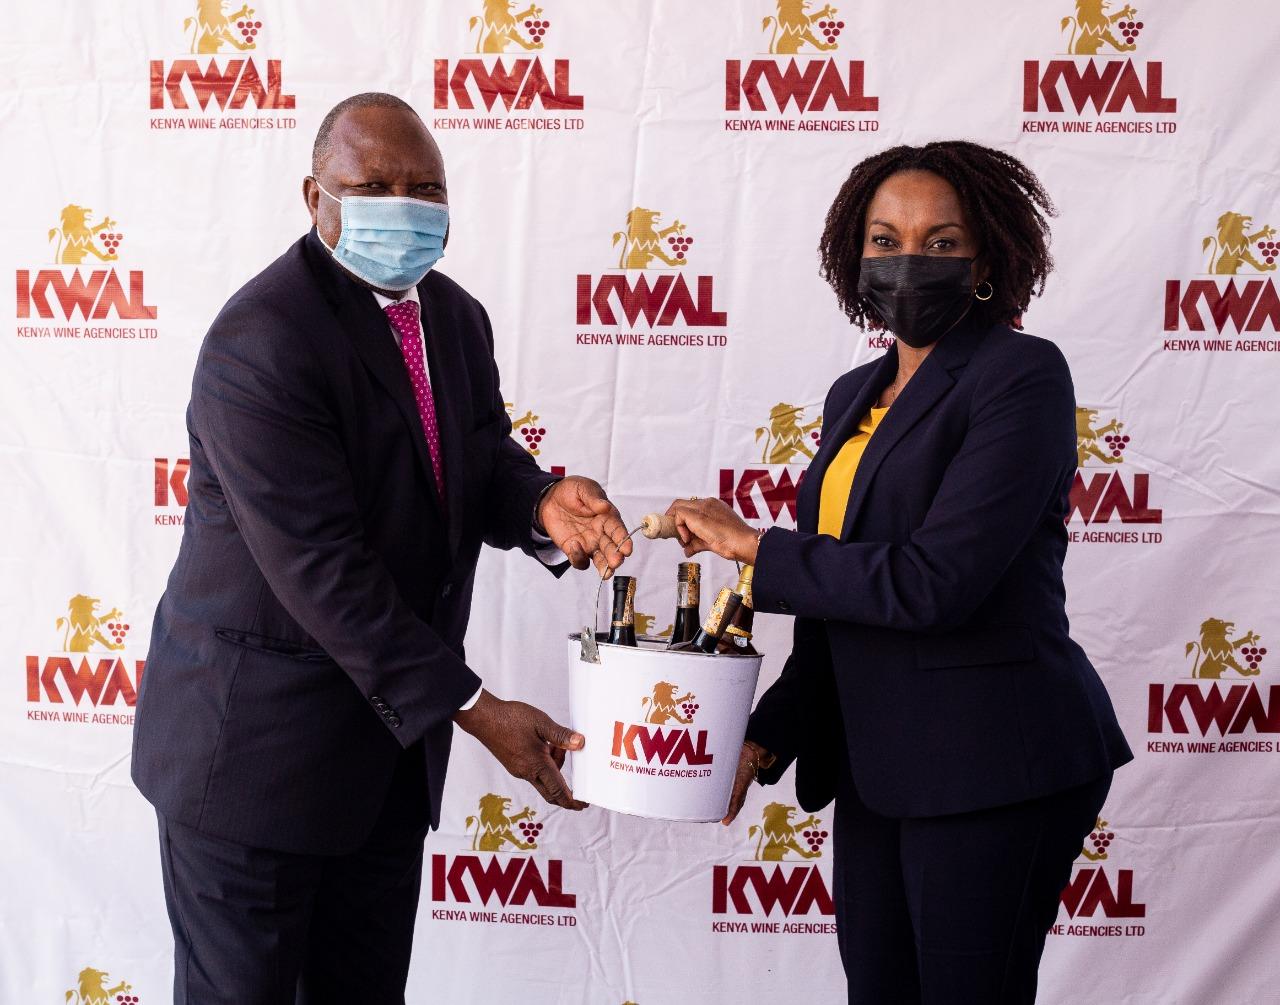 KWAL-MD-Lina-gifts-SA-High-Commisioner-HE-M-J-Mahlangu.